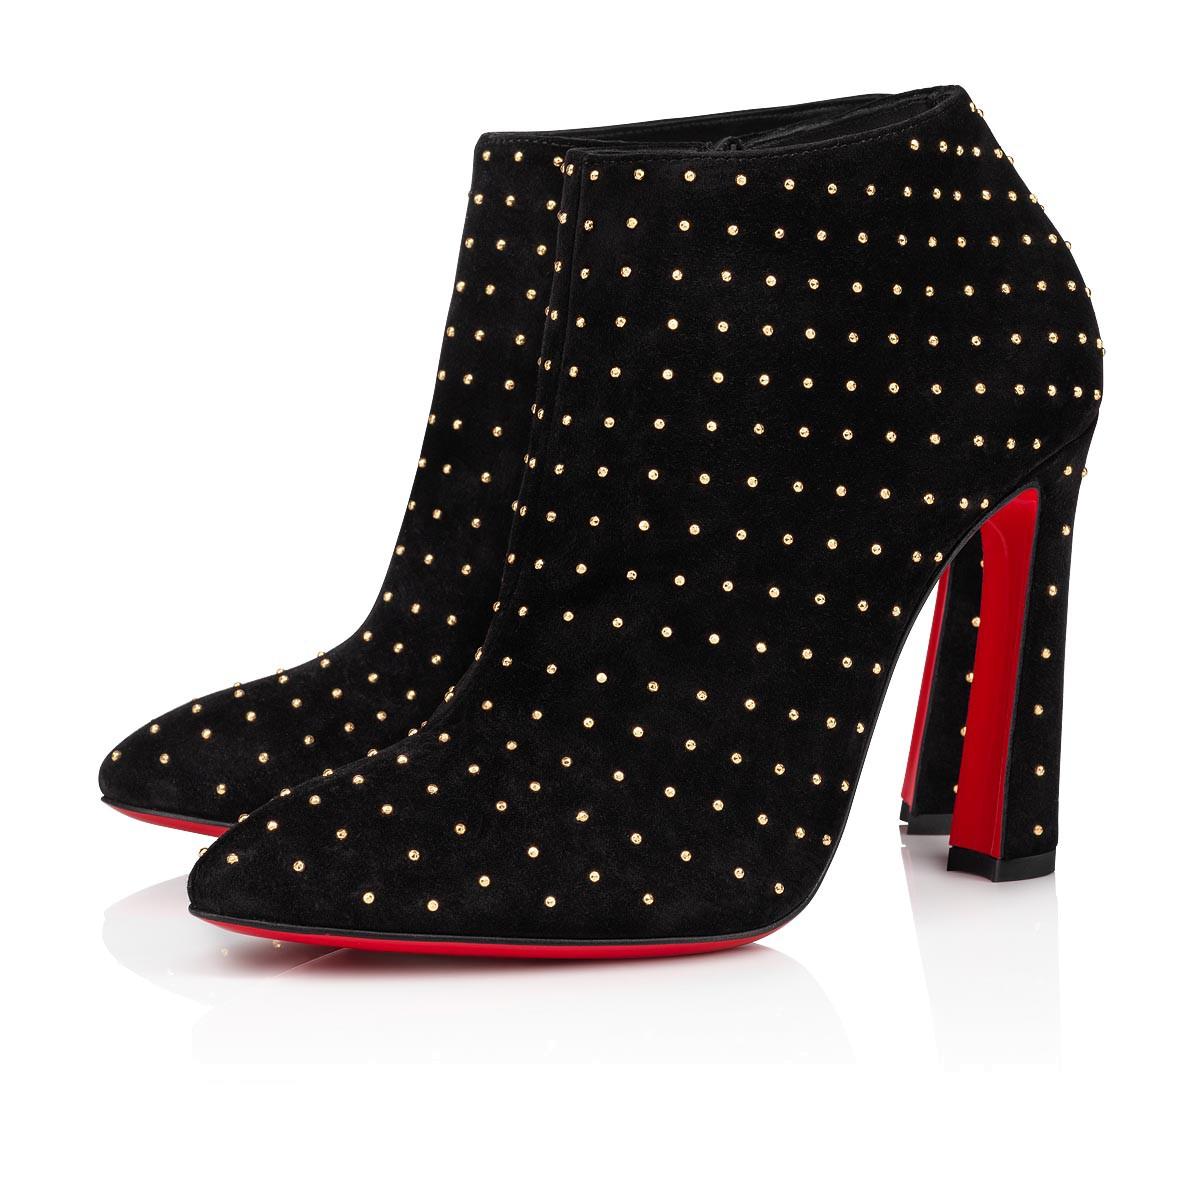 Shoes - Eleonor Plume - Christian Louboutin